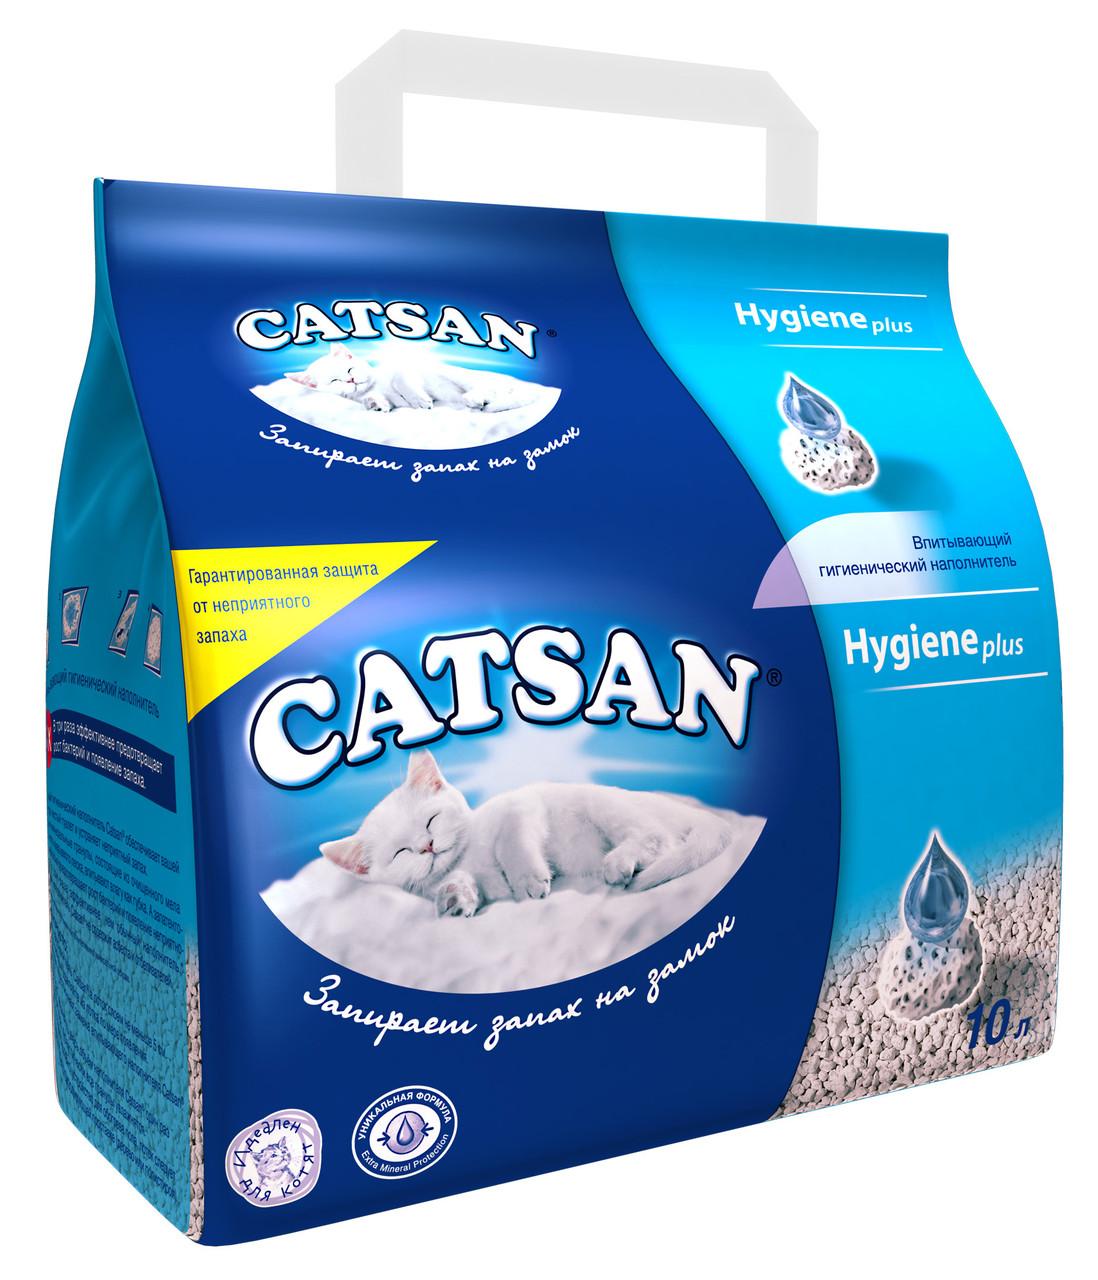 Catsan Впитывающий наполнитель, 10 л